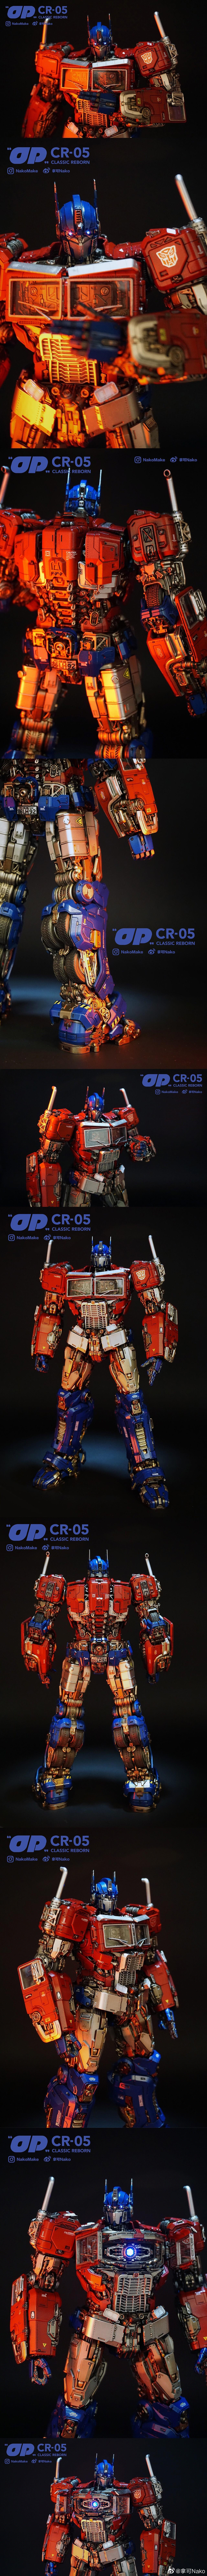 G798_NakoMake_Optimus_Prime_BUMBLEBEE_ver_GK_027.jpg